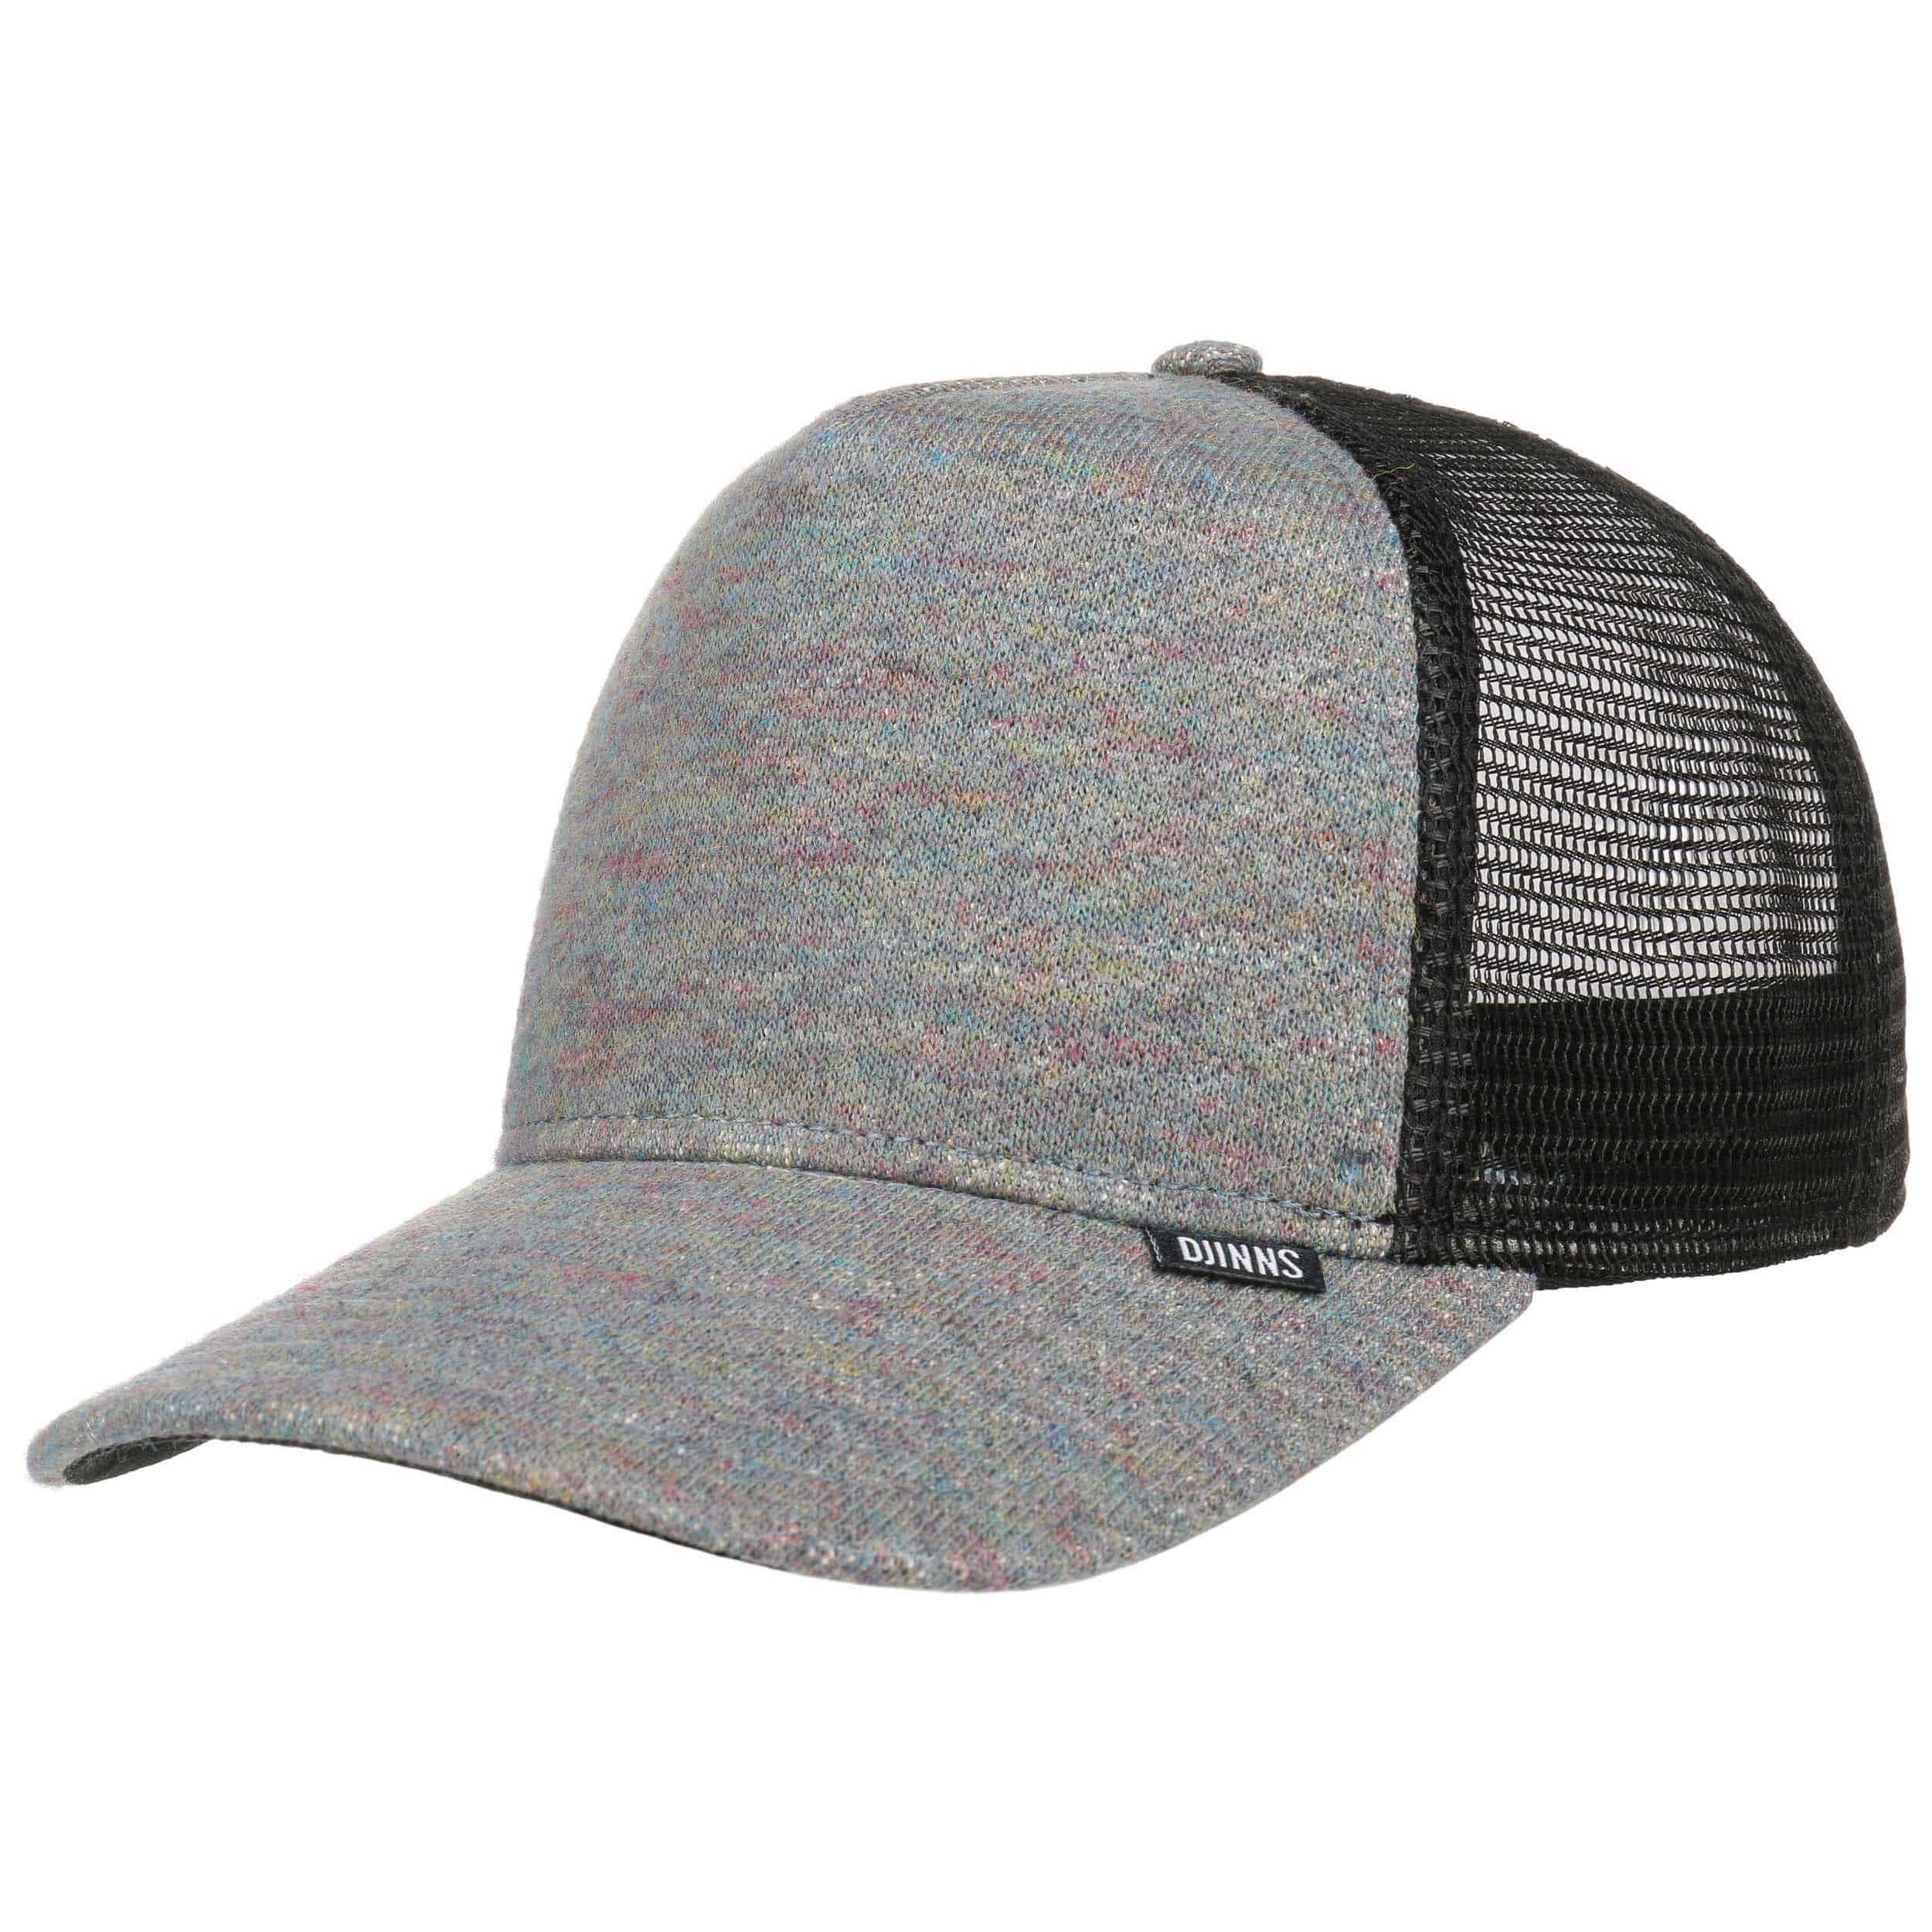 koper trucker cap by djinns eur 24 95 hats caps. Black Bedroom Furniture Sets. Home Design Ideas